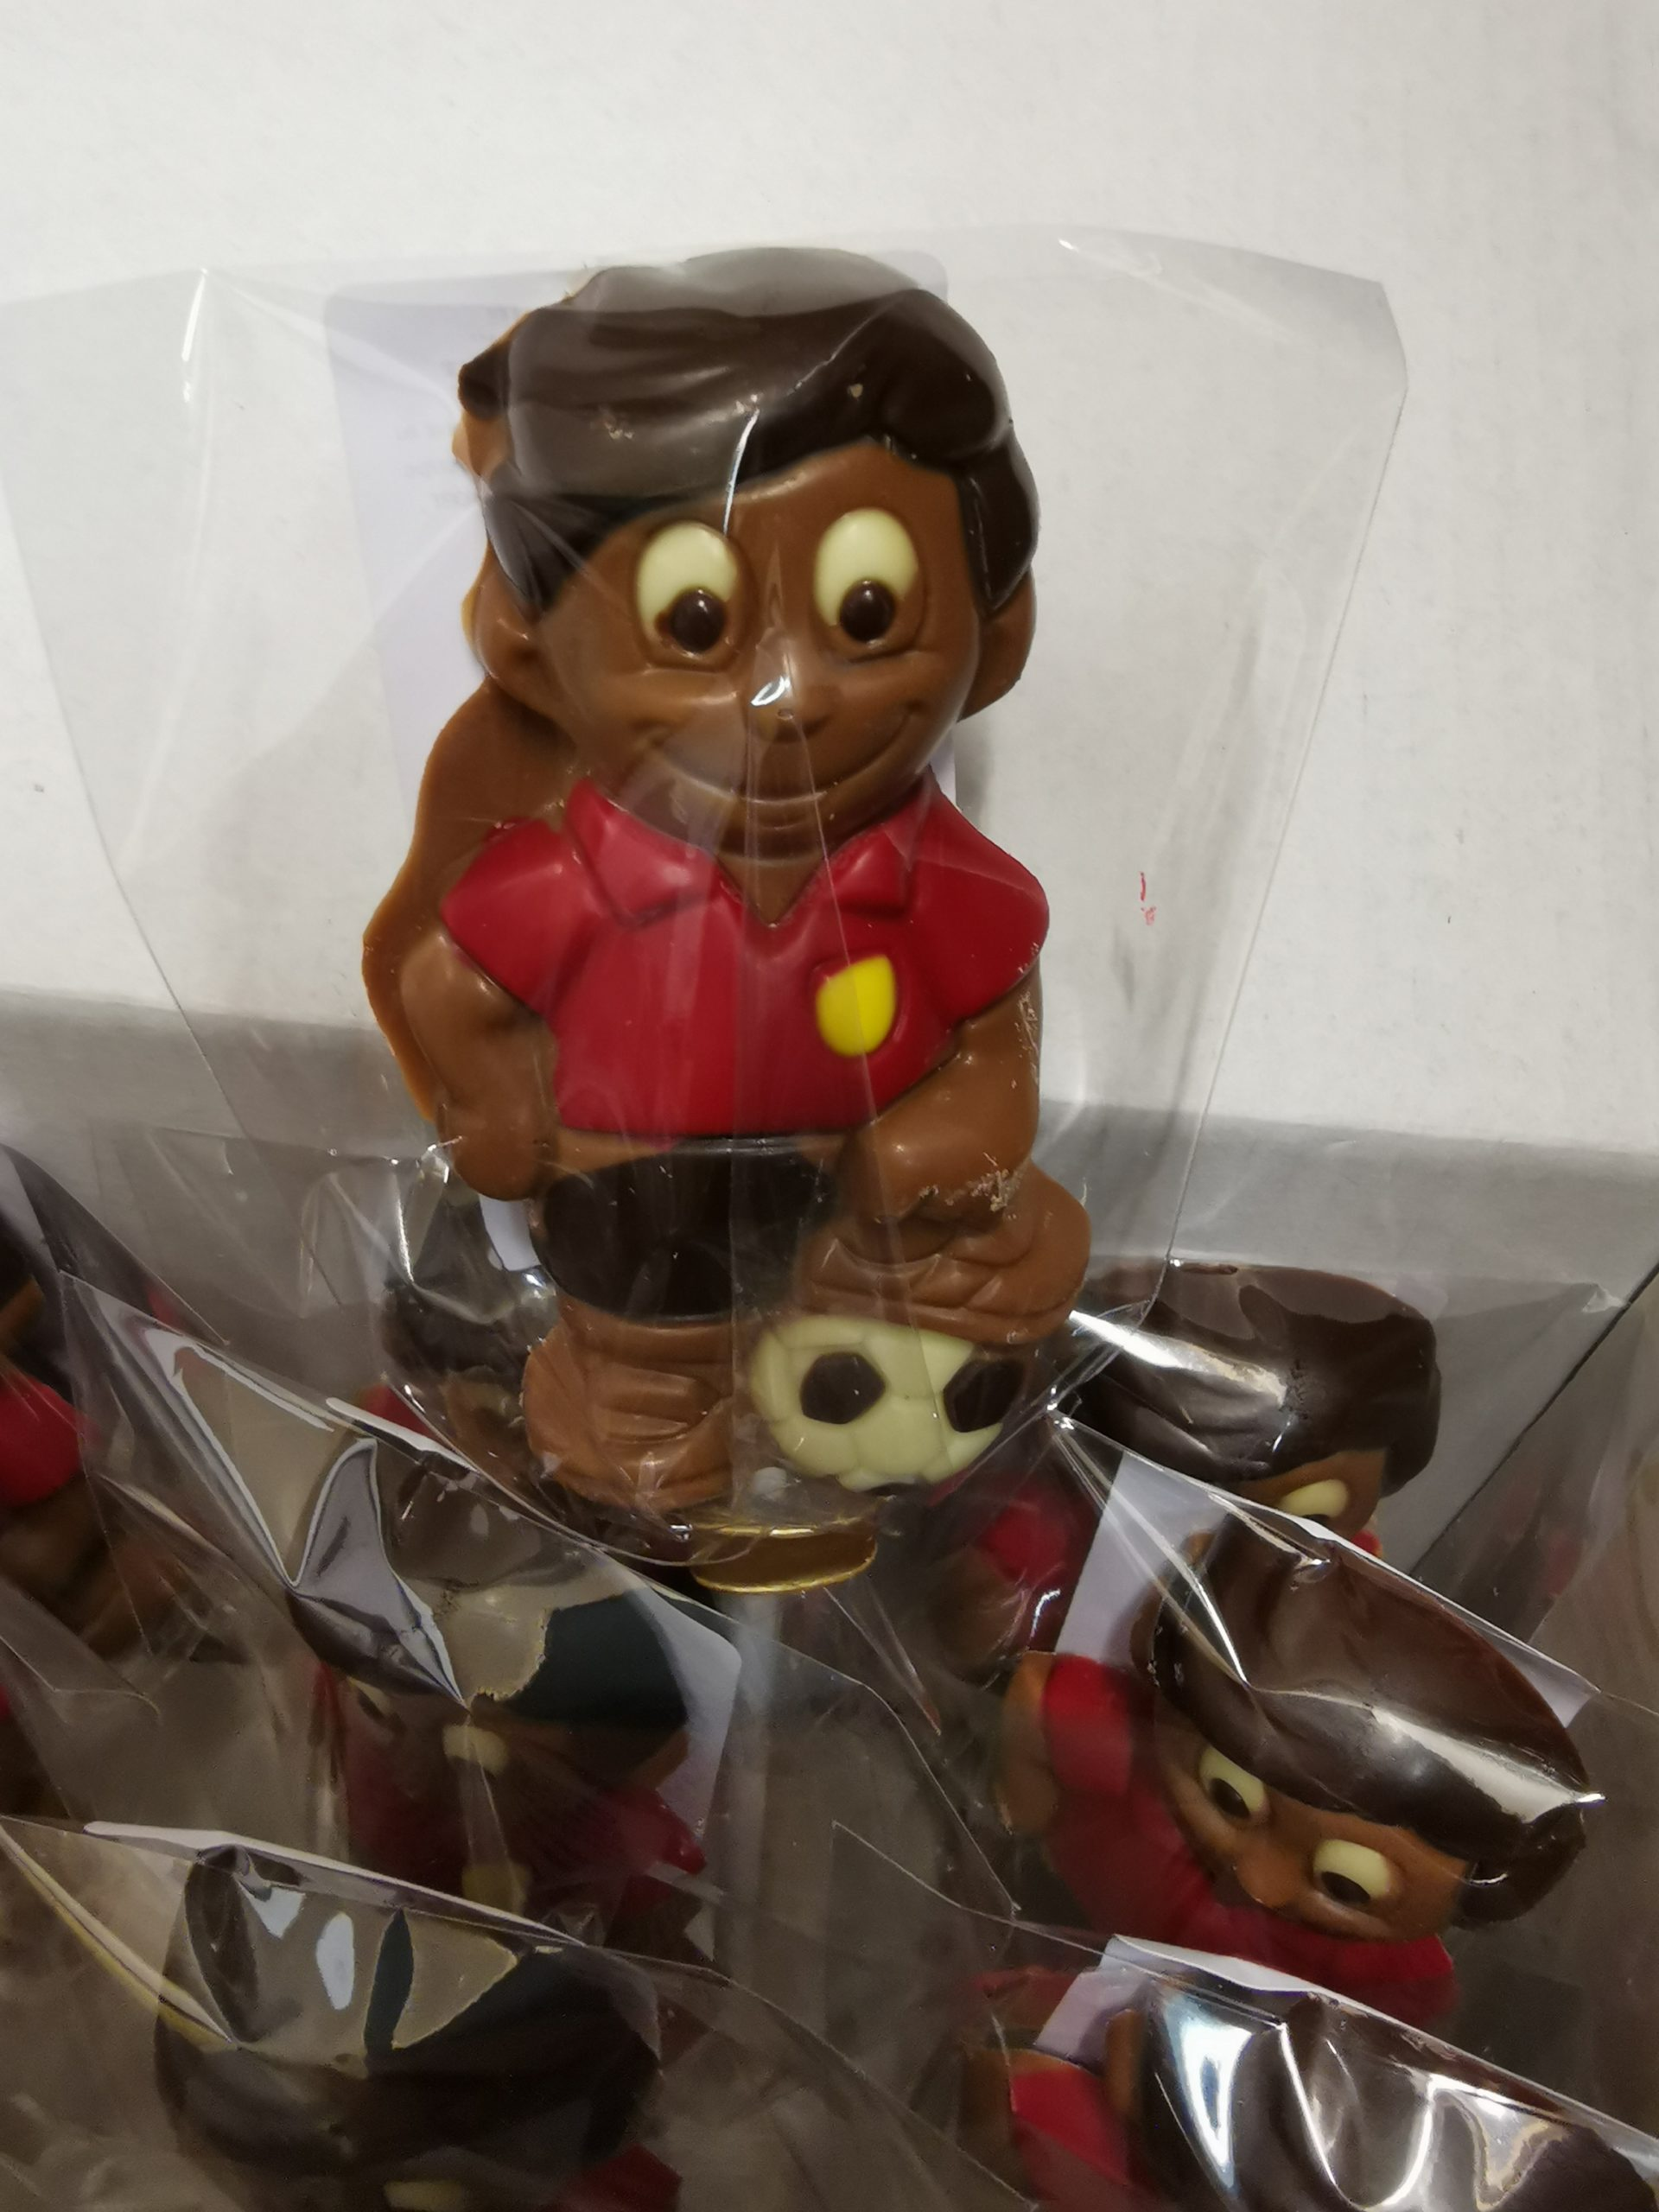 Kevin, de voetballer lolly in melkchocolade